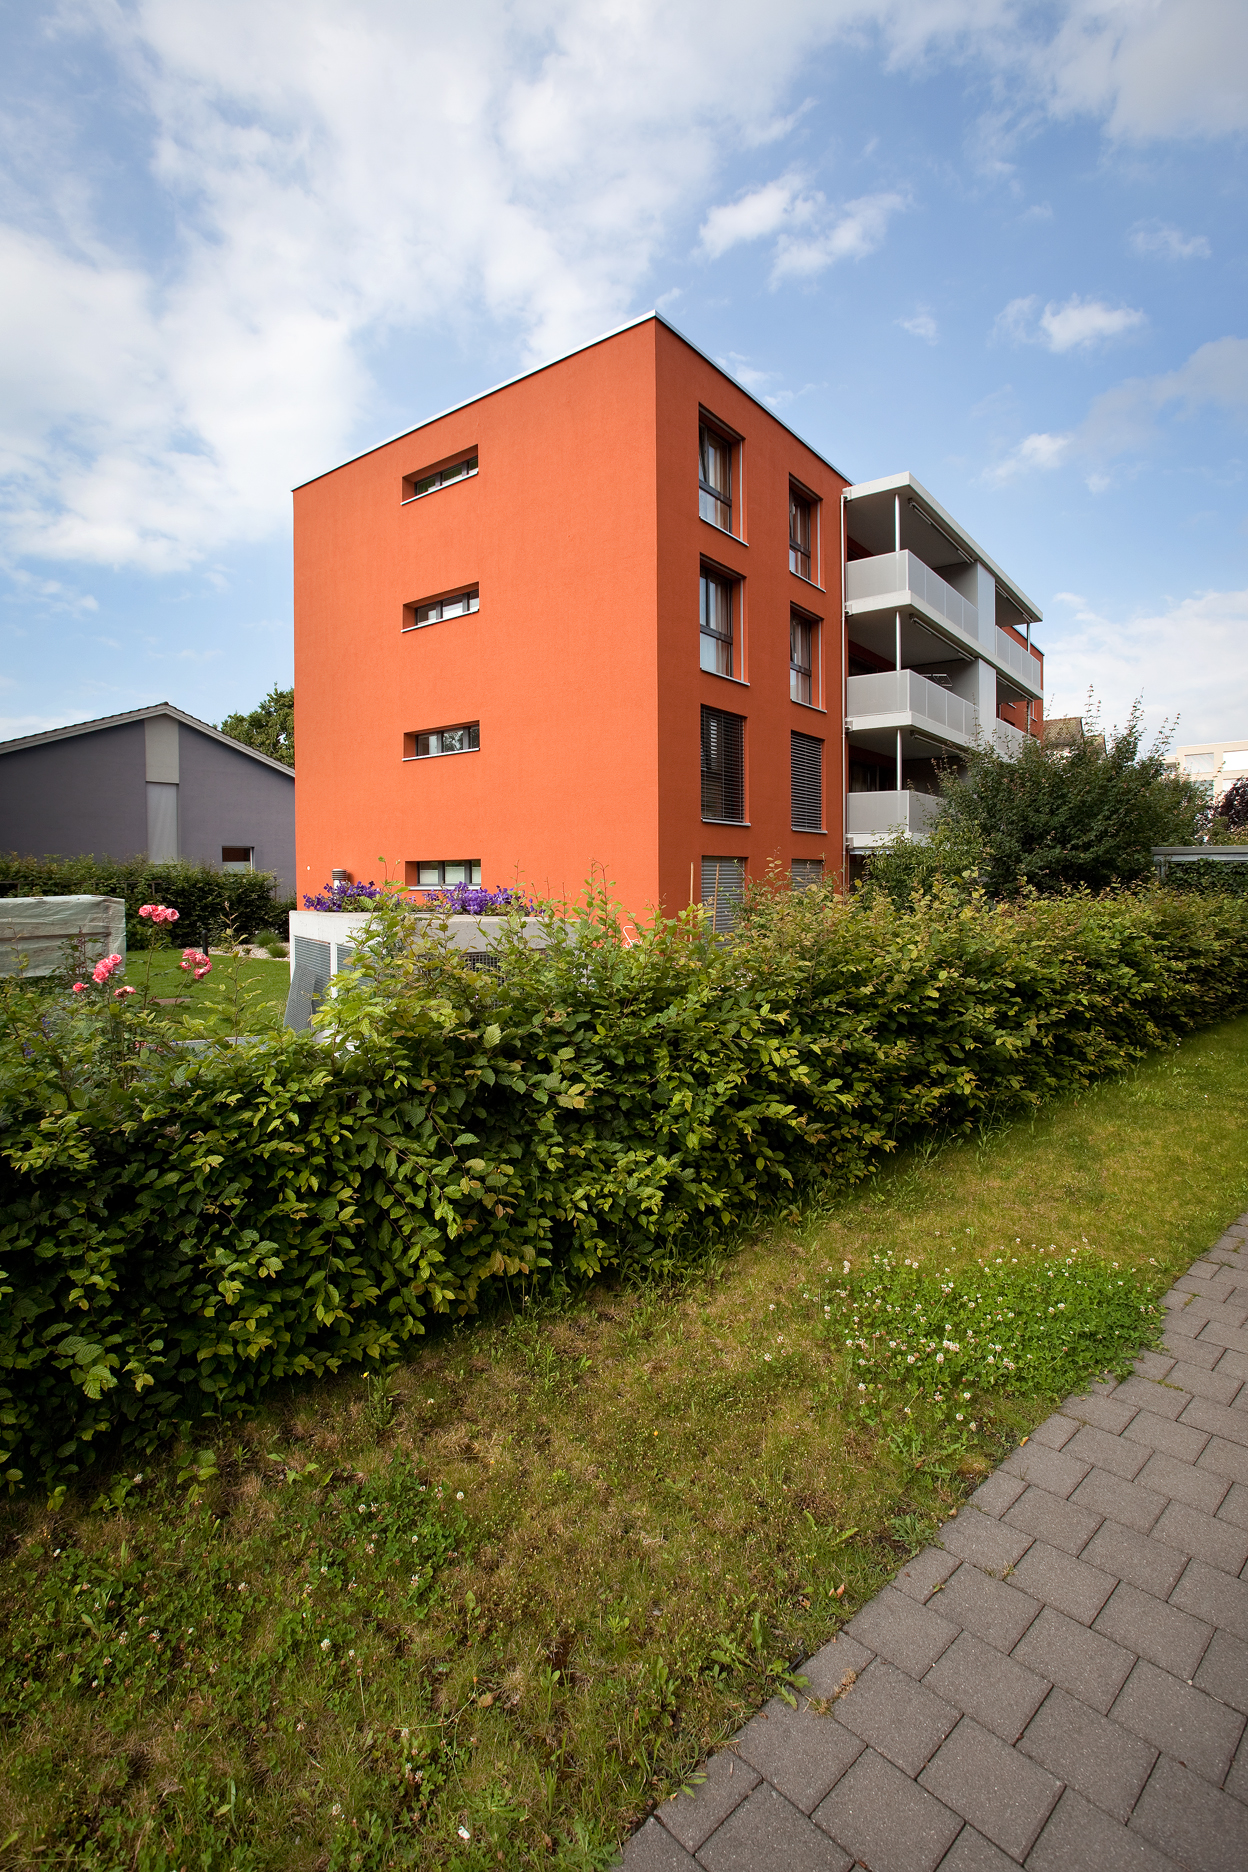 BEECK Renosil Project - Apartments in Lenzburg Switzerland